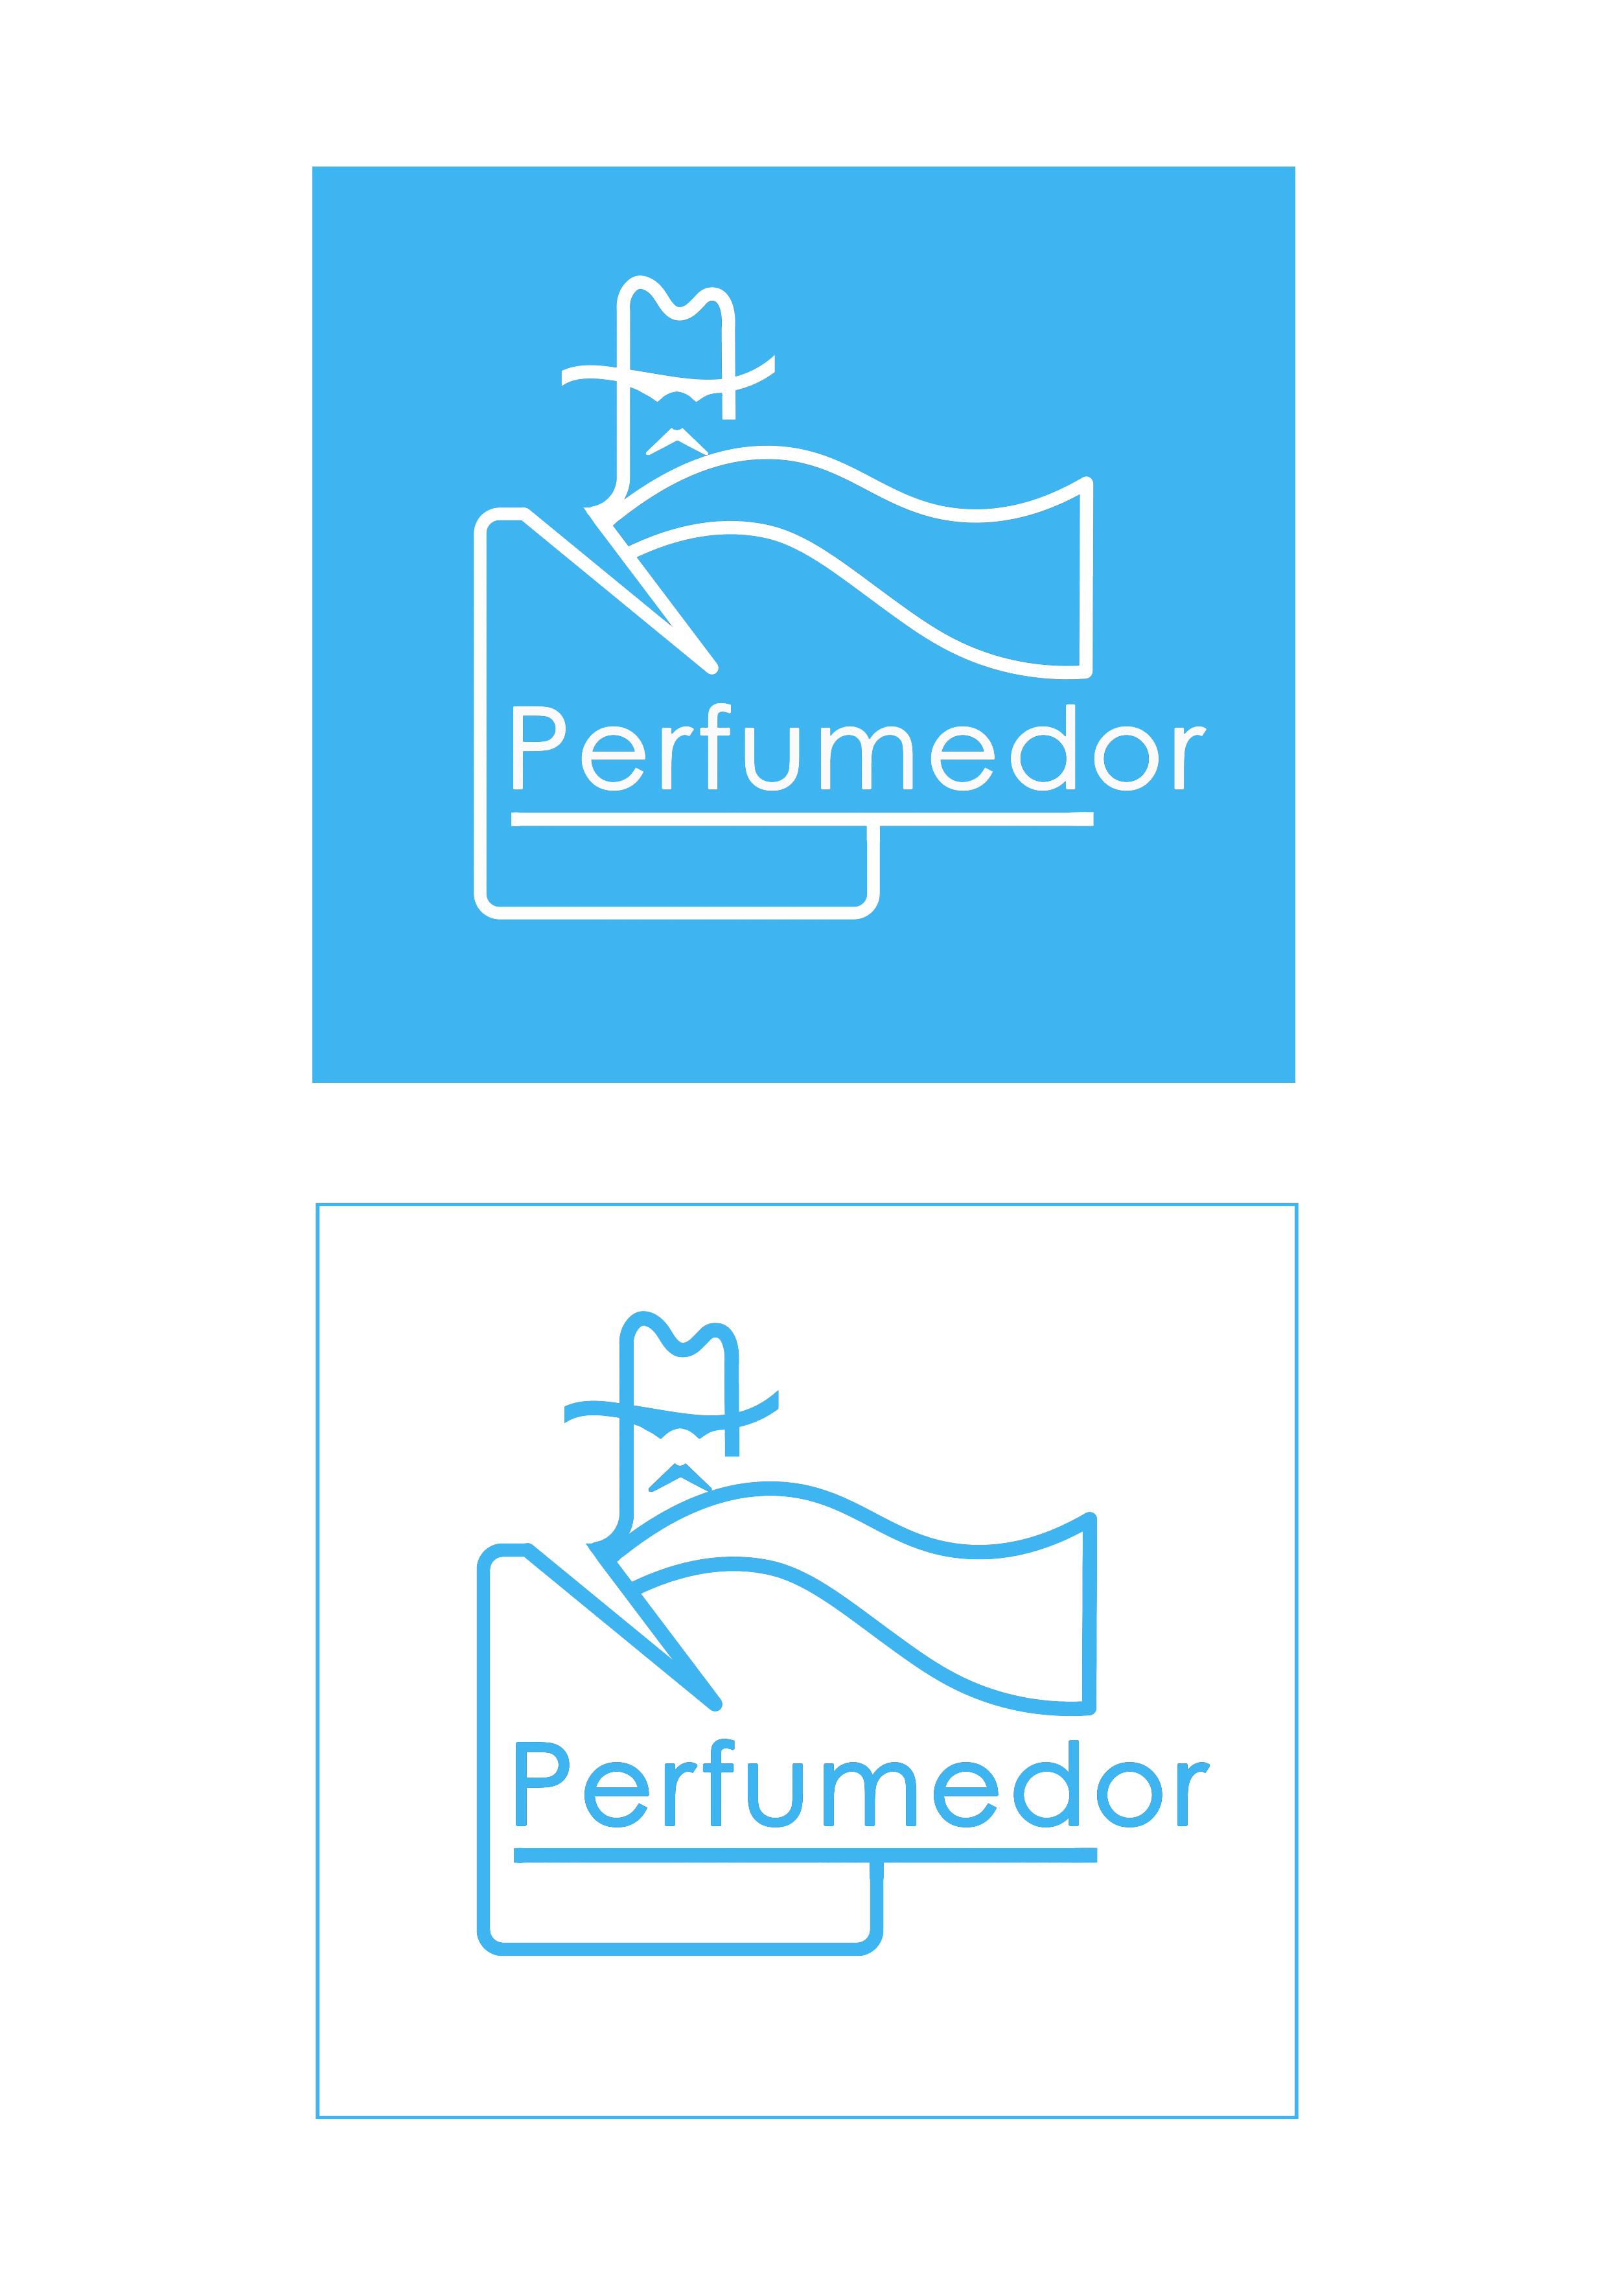 Логотип для интернет-магазина парфюмерии фото f_7495b477ecc1b800.jpg